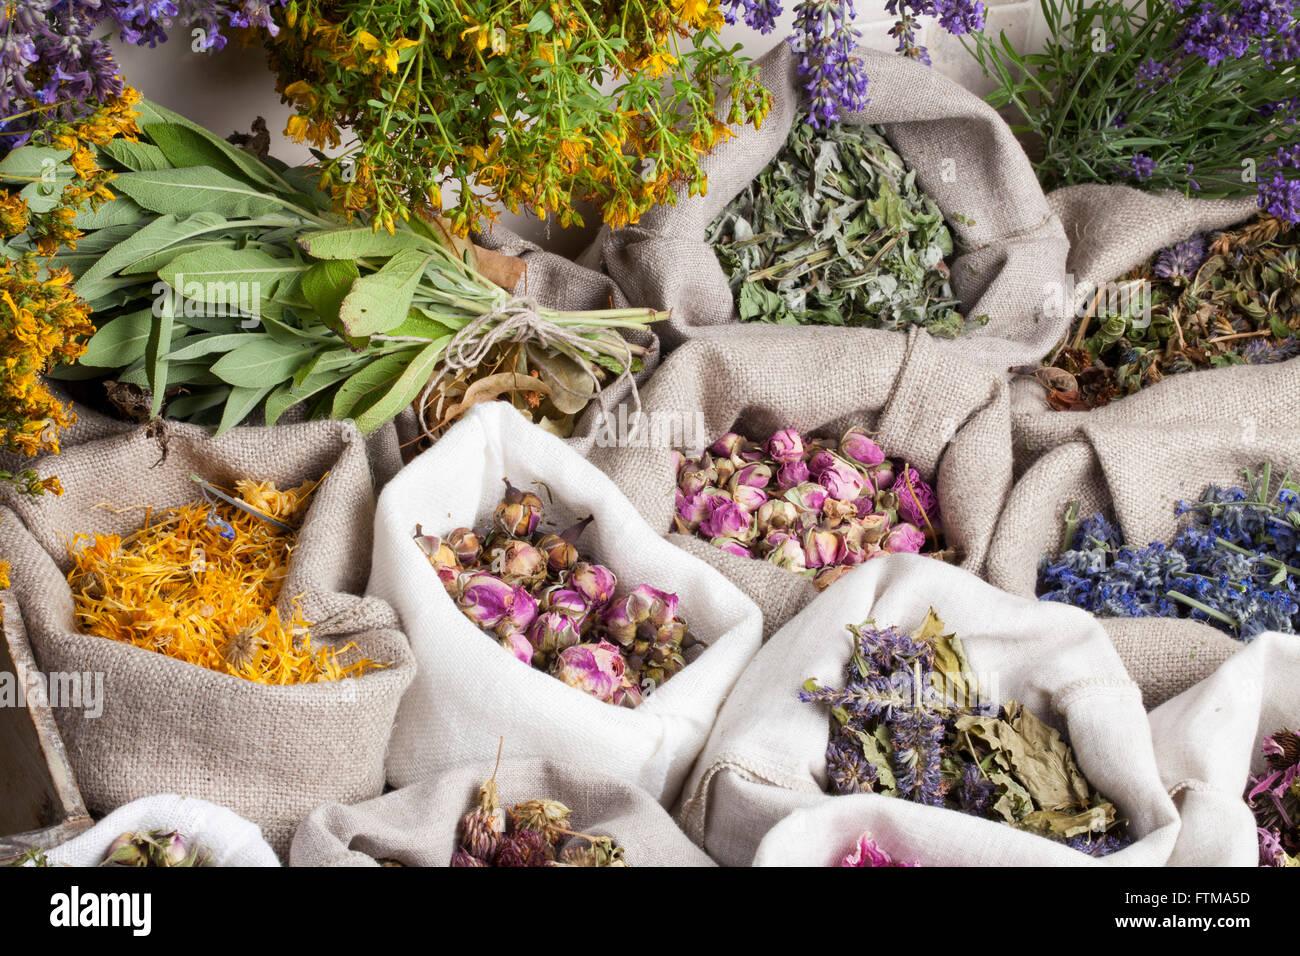 Healing medical herbs in a linen sacks - Stock Image